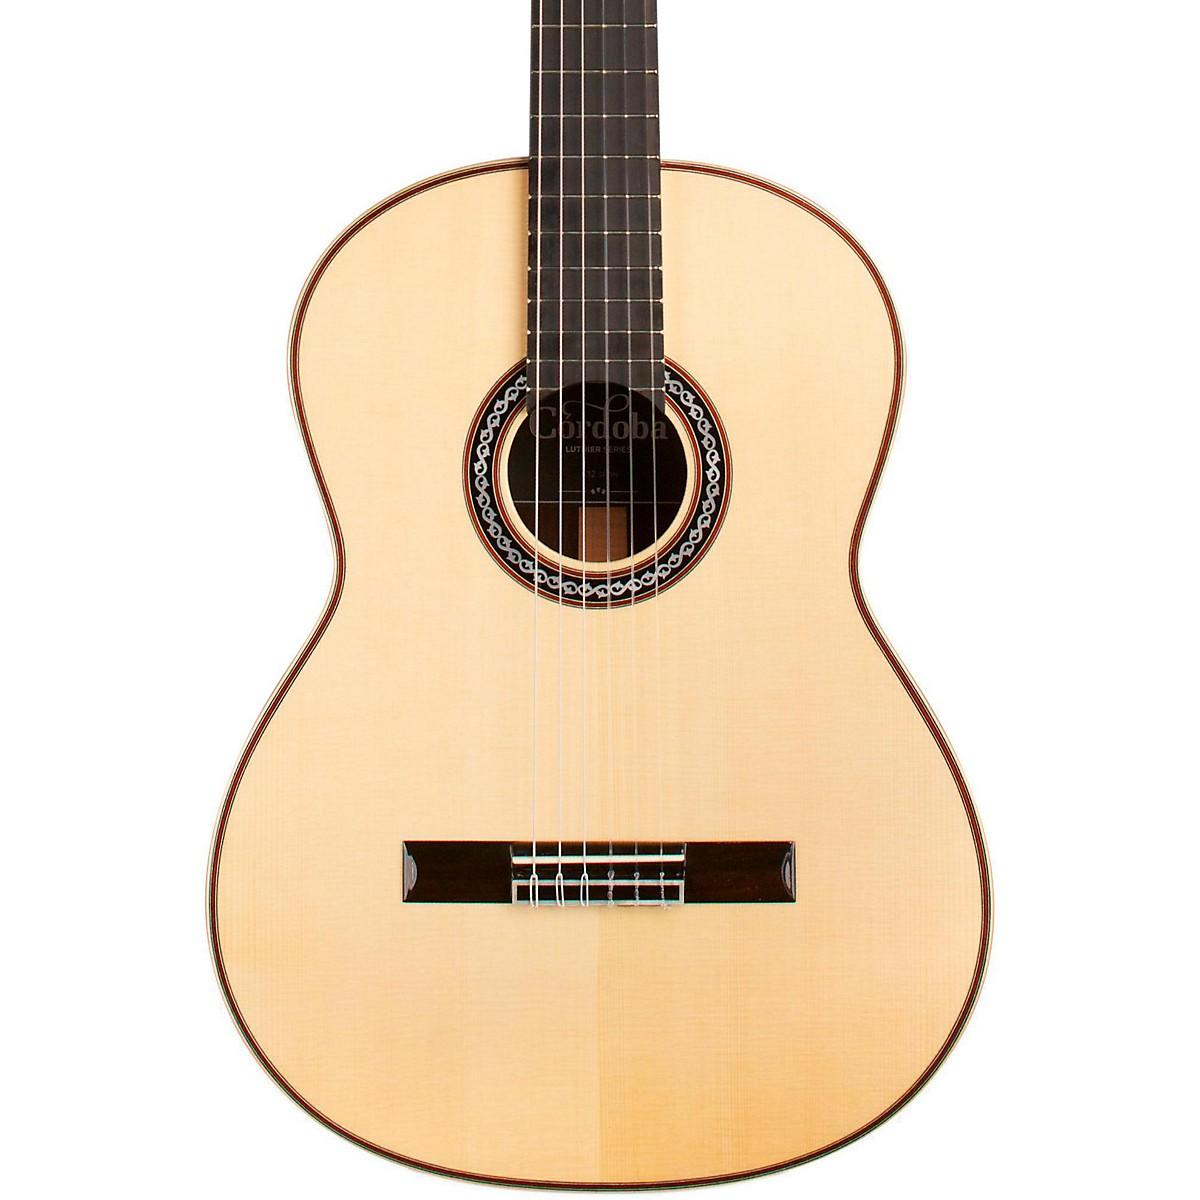 Cordoba C12 SP Classical Guitar